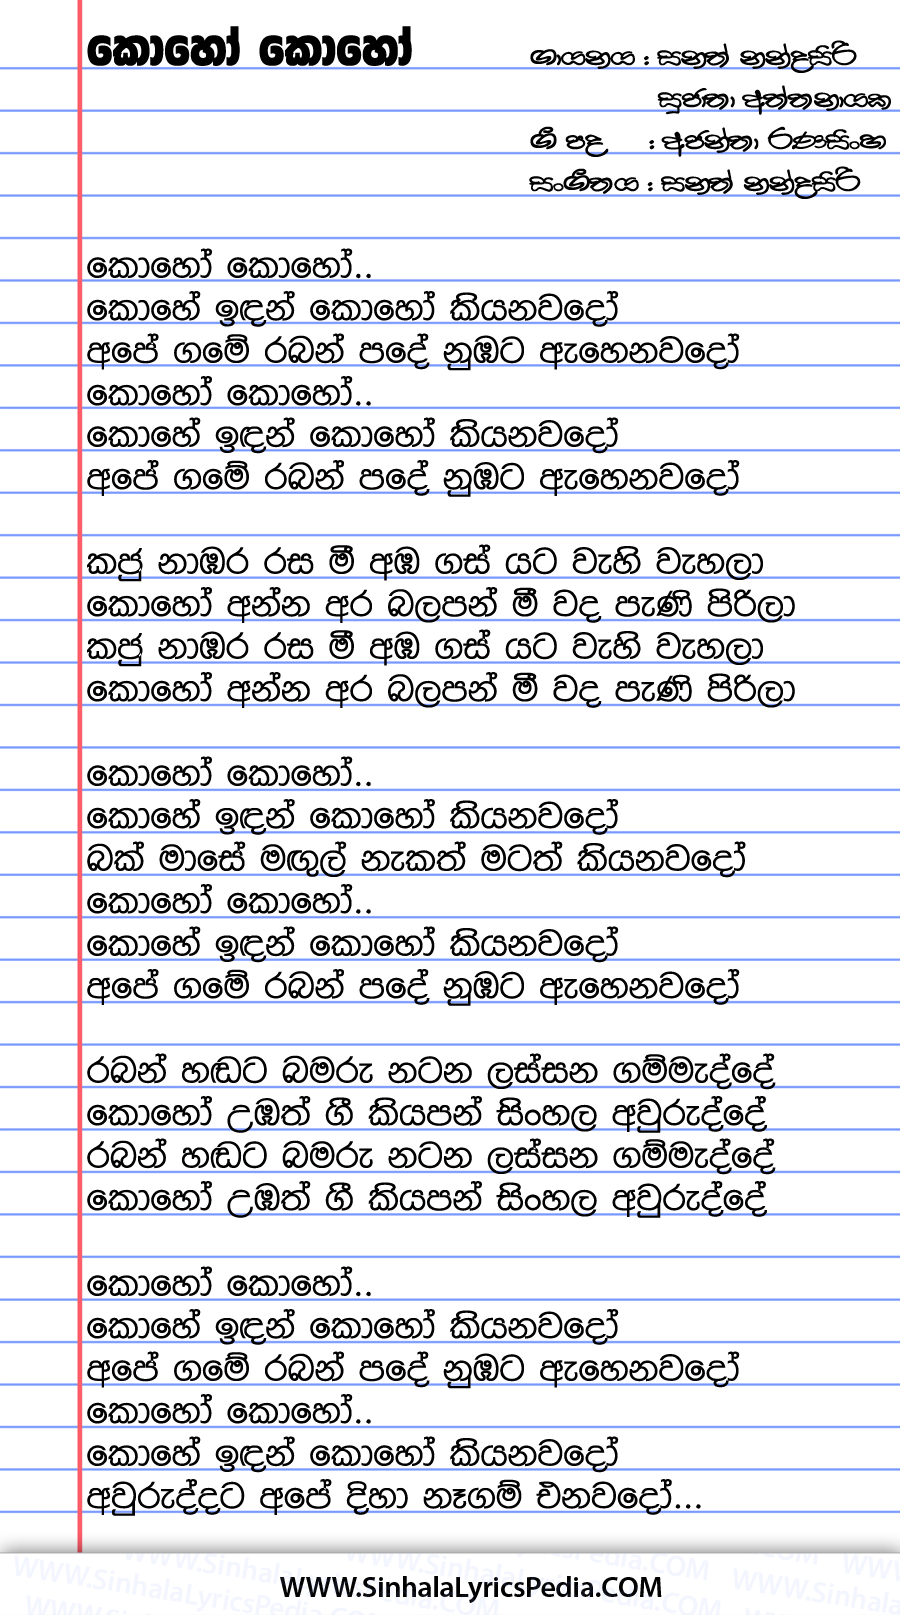 Koho Koho Kohe Indan Song Lyrics